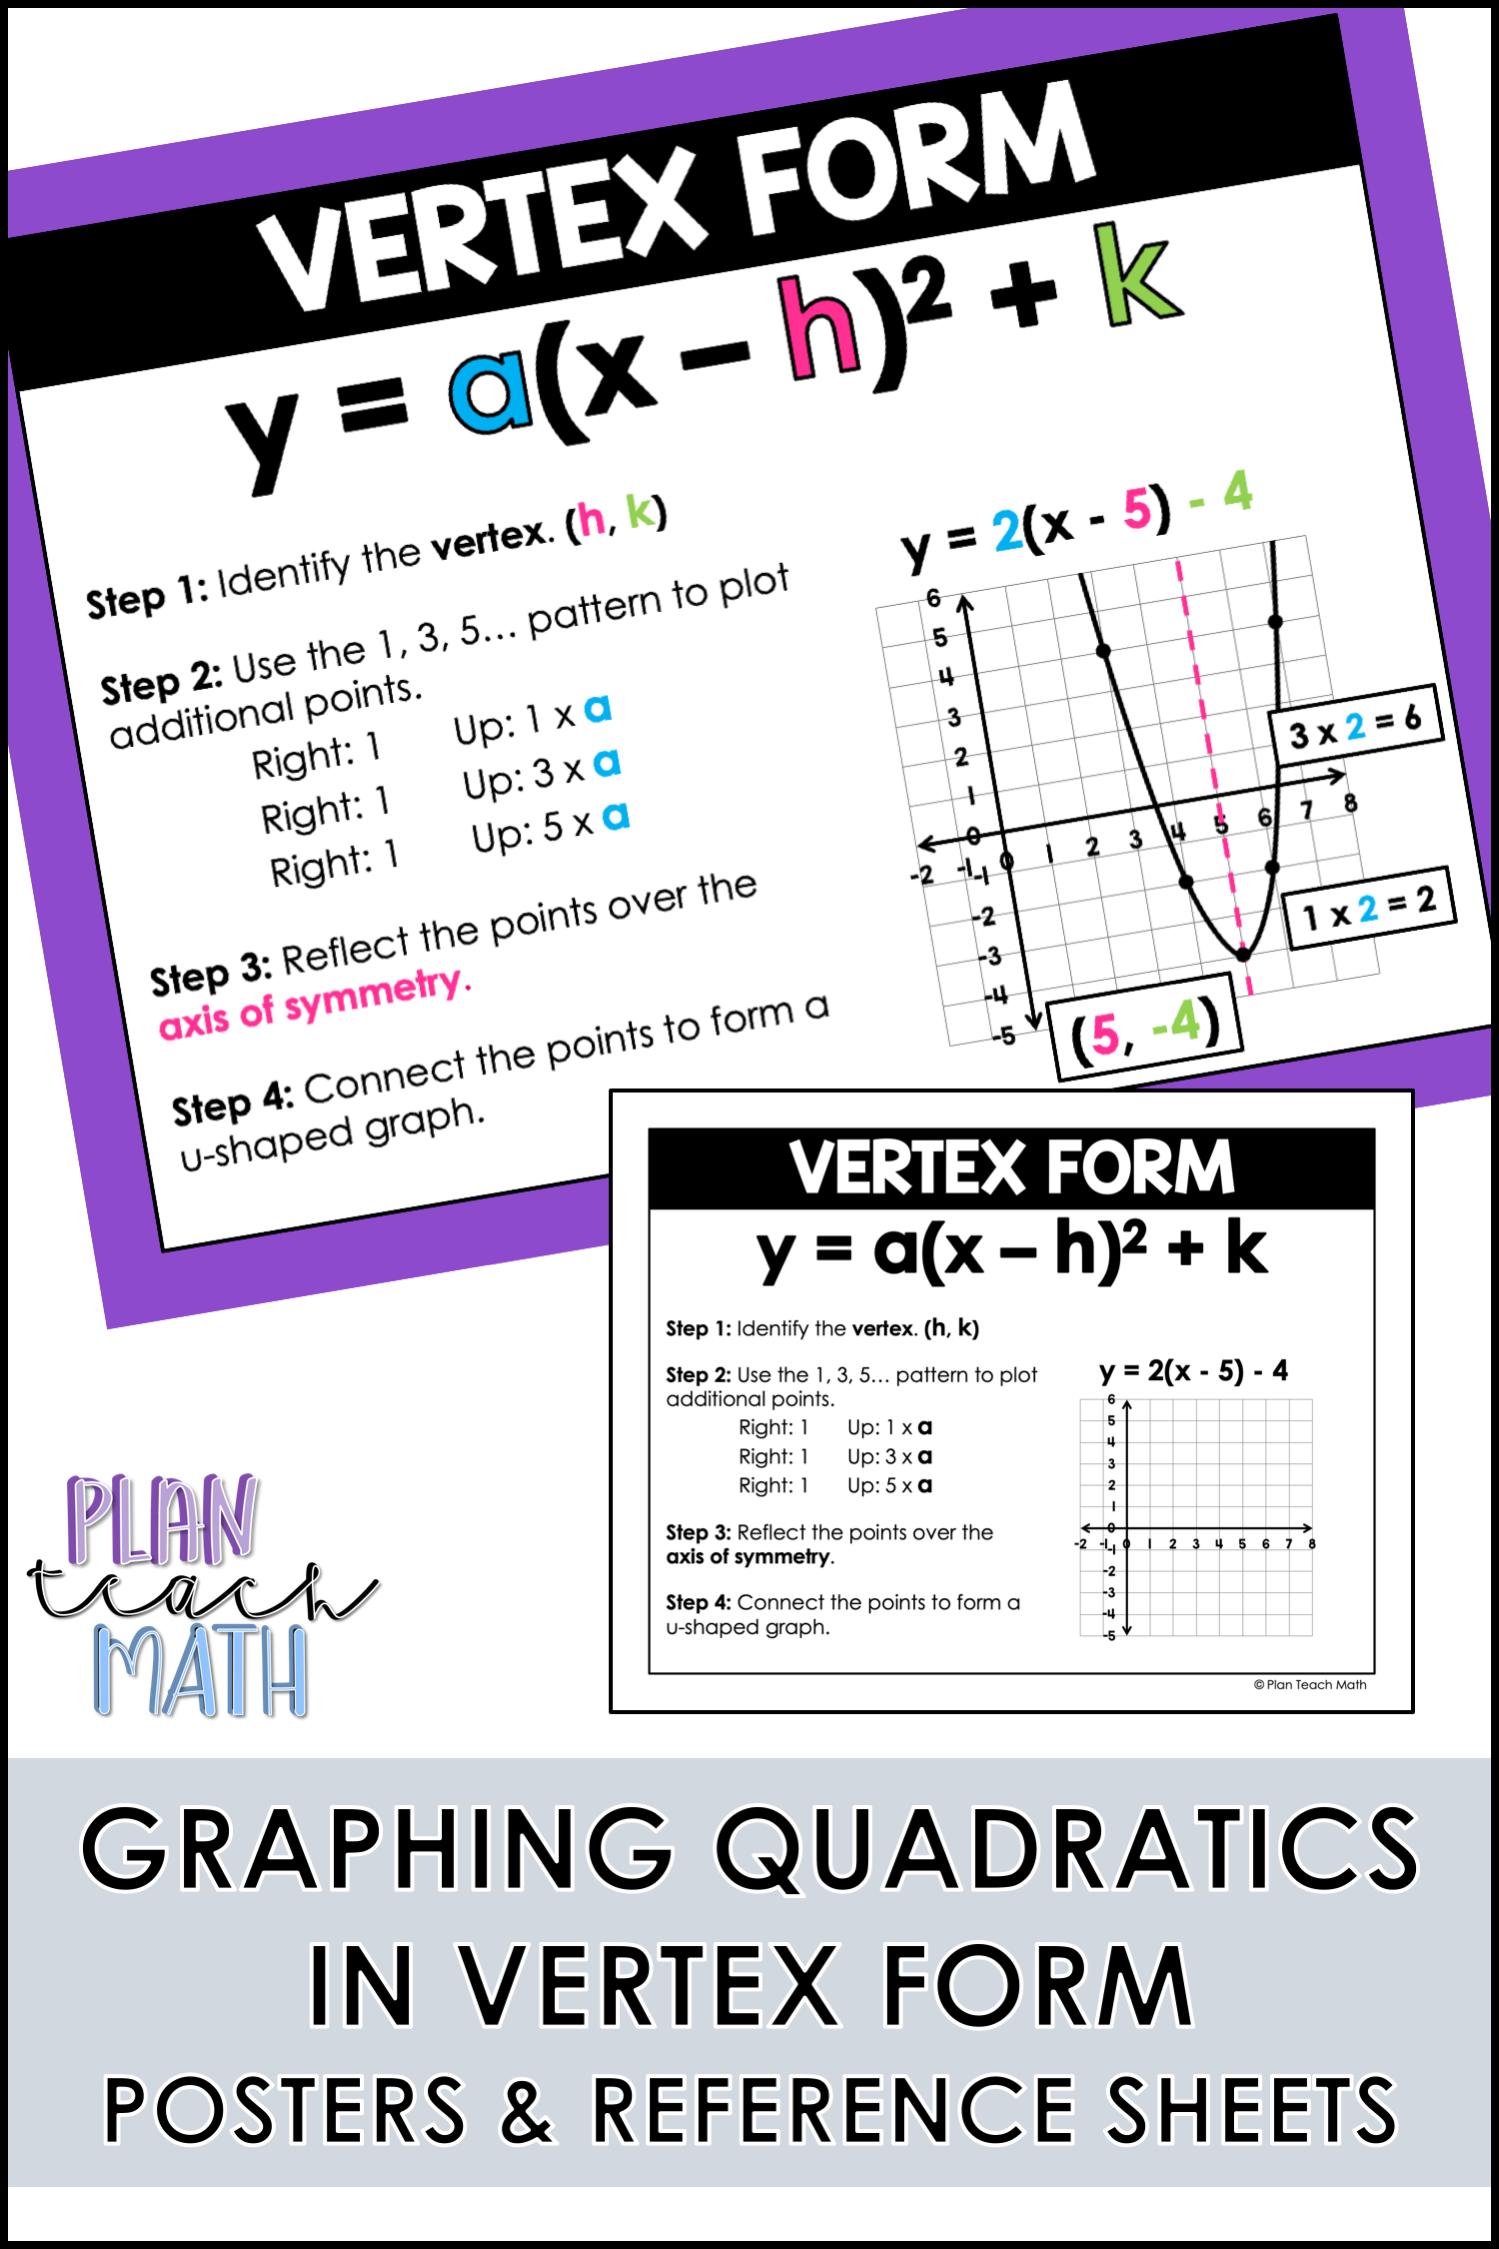 Graphing Quadratics Standard Form And Vertex Form Posters